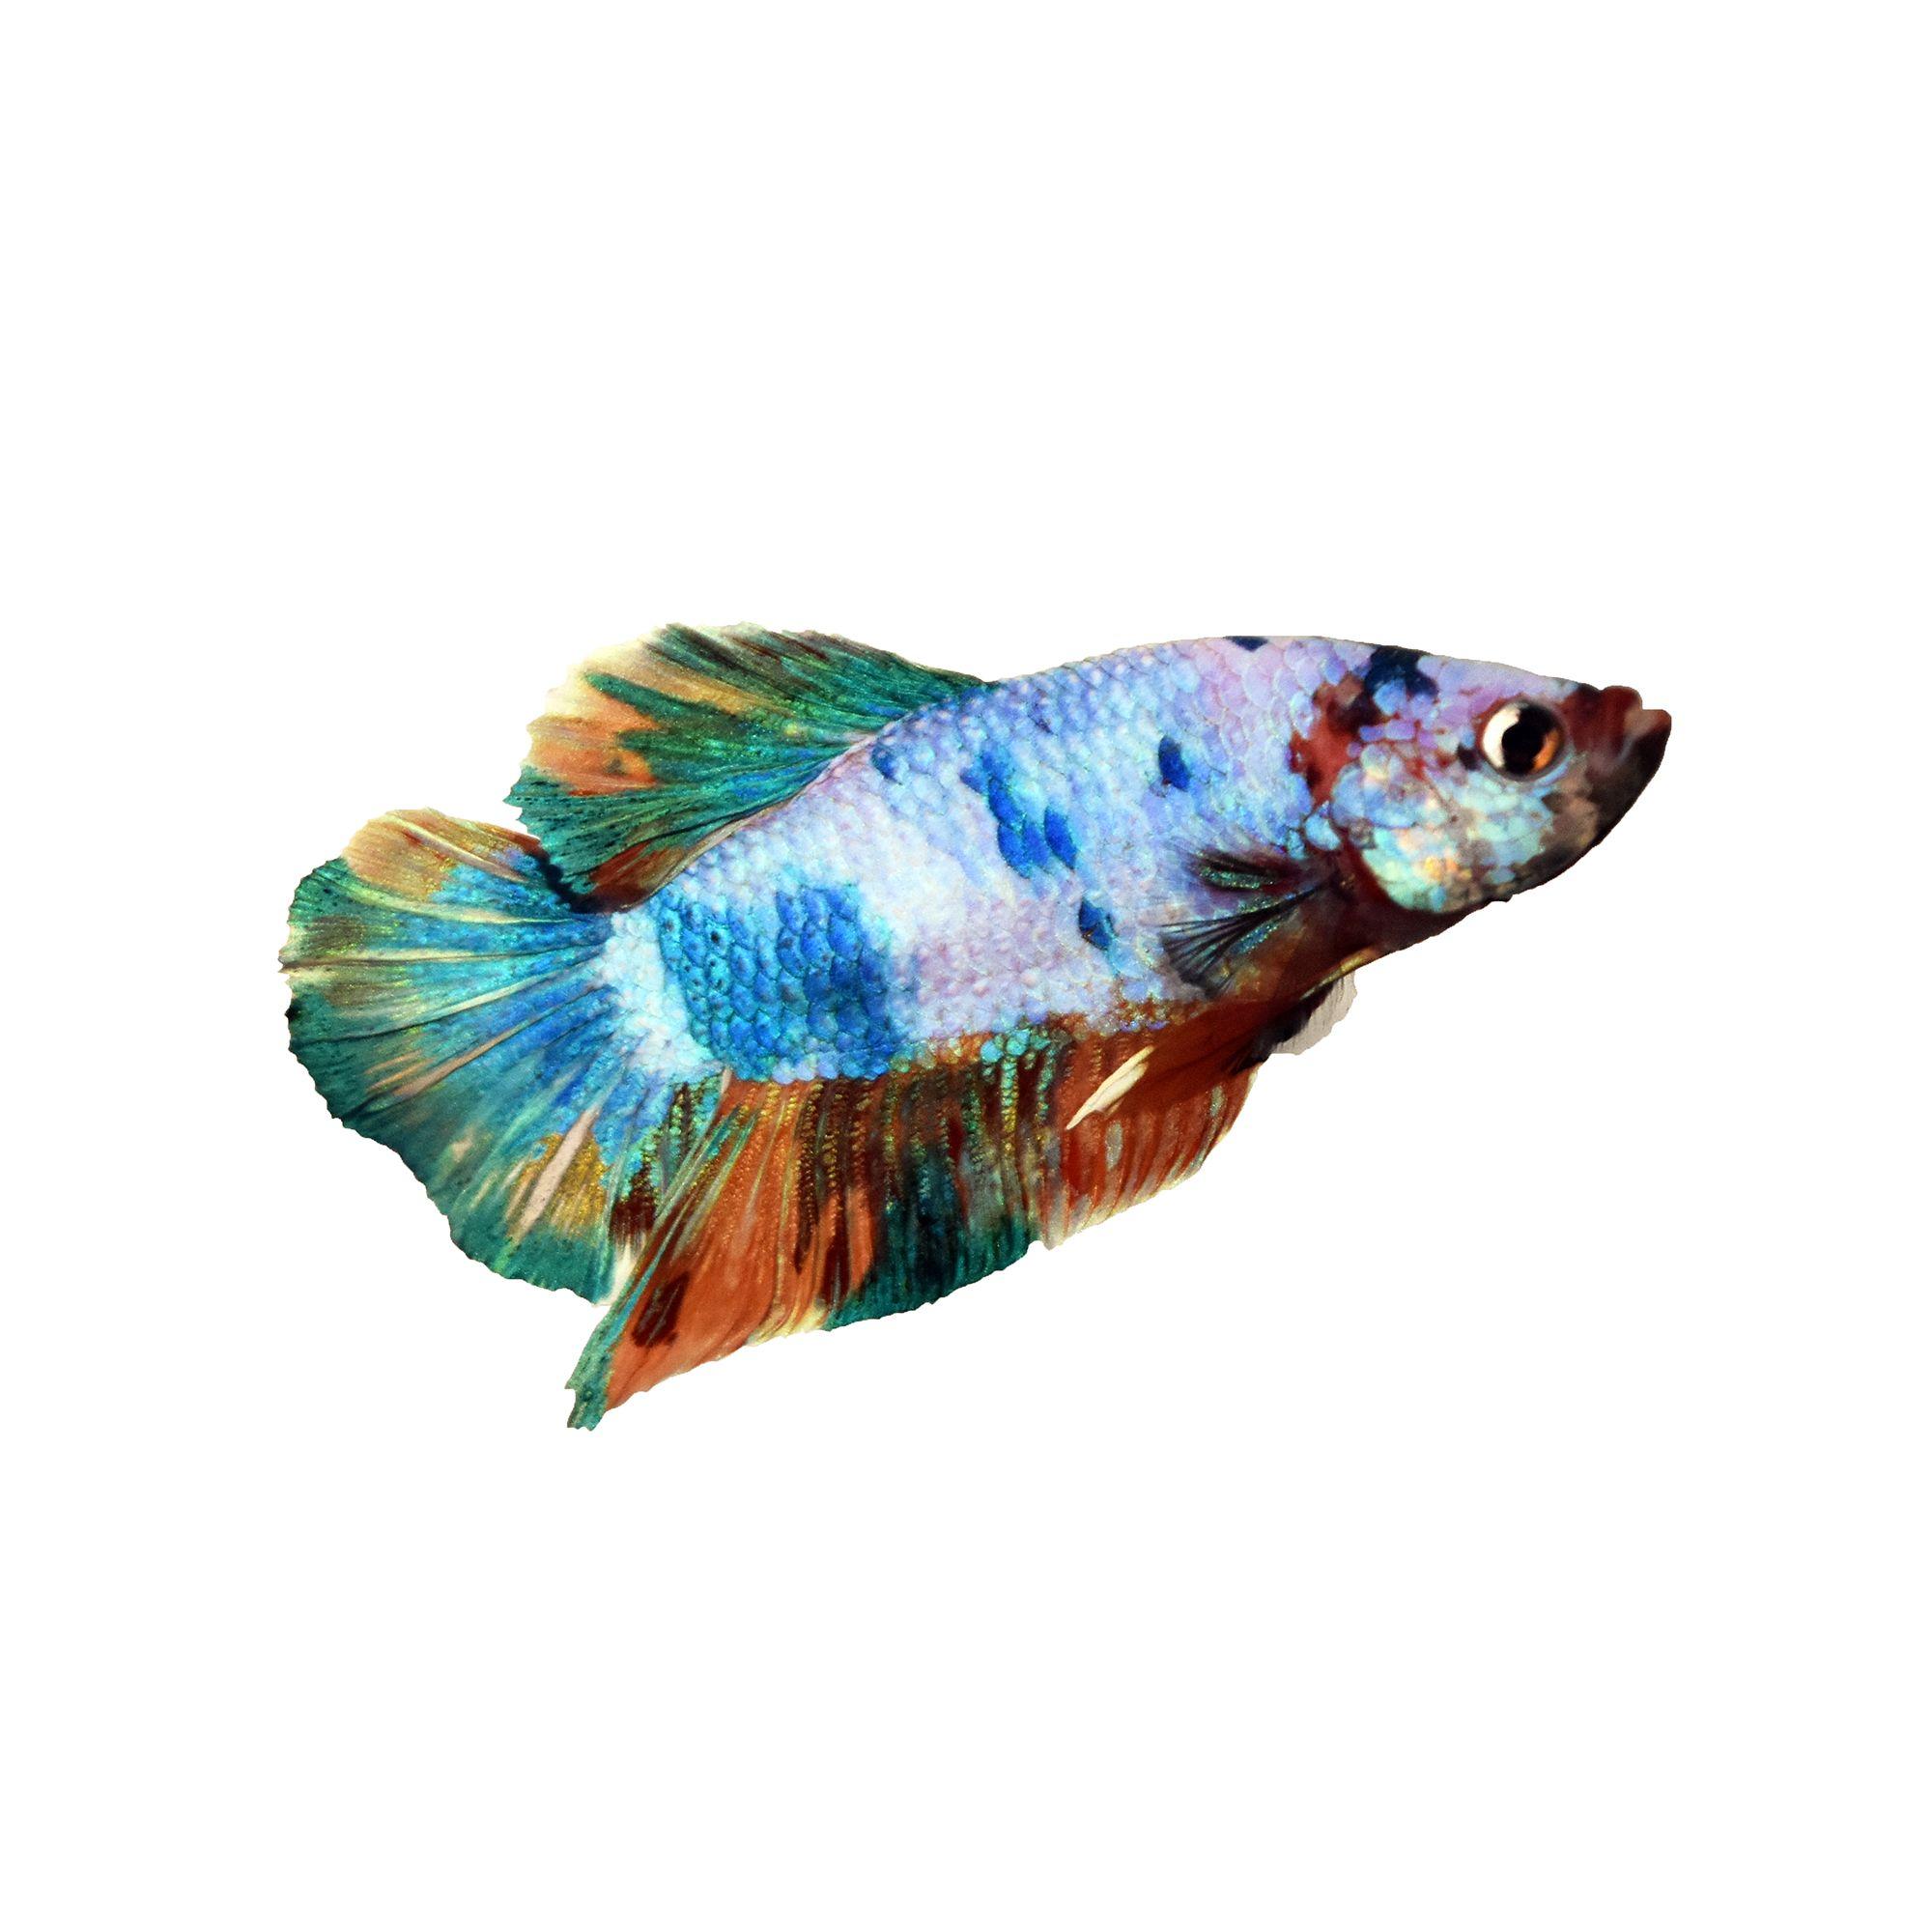 Rainbow Male Betta Fish Fish Goldfish Betta More Petsmart